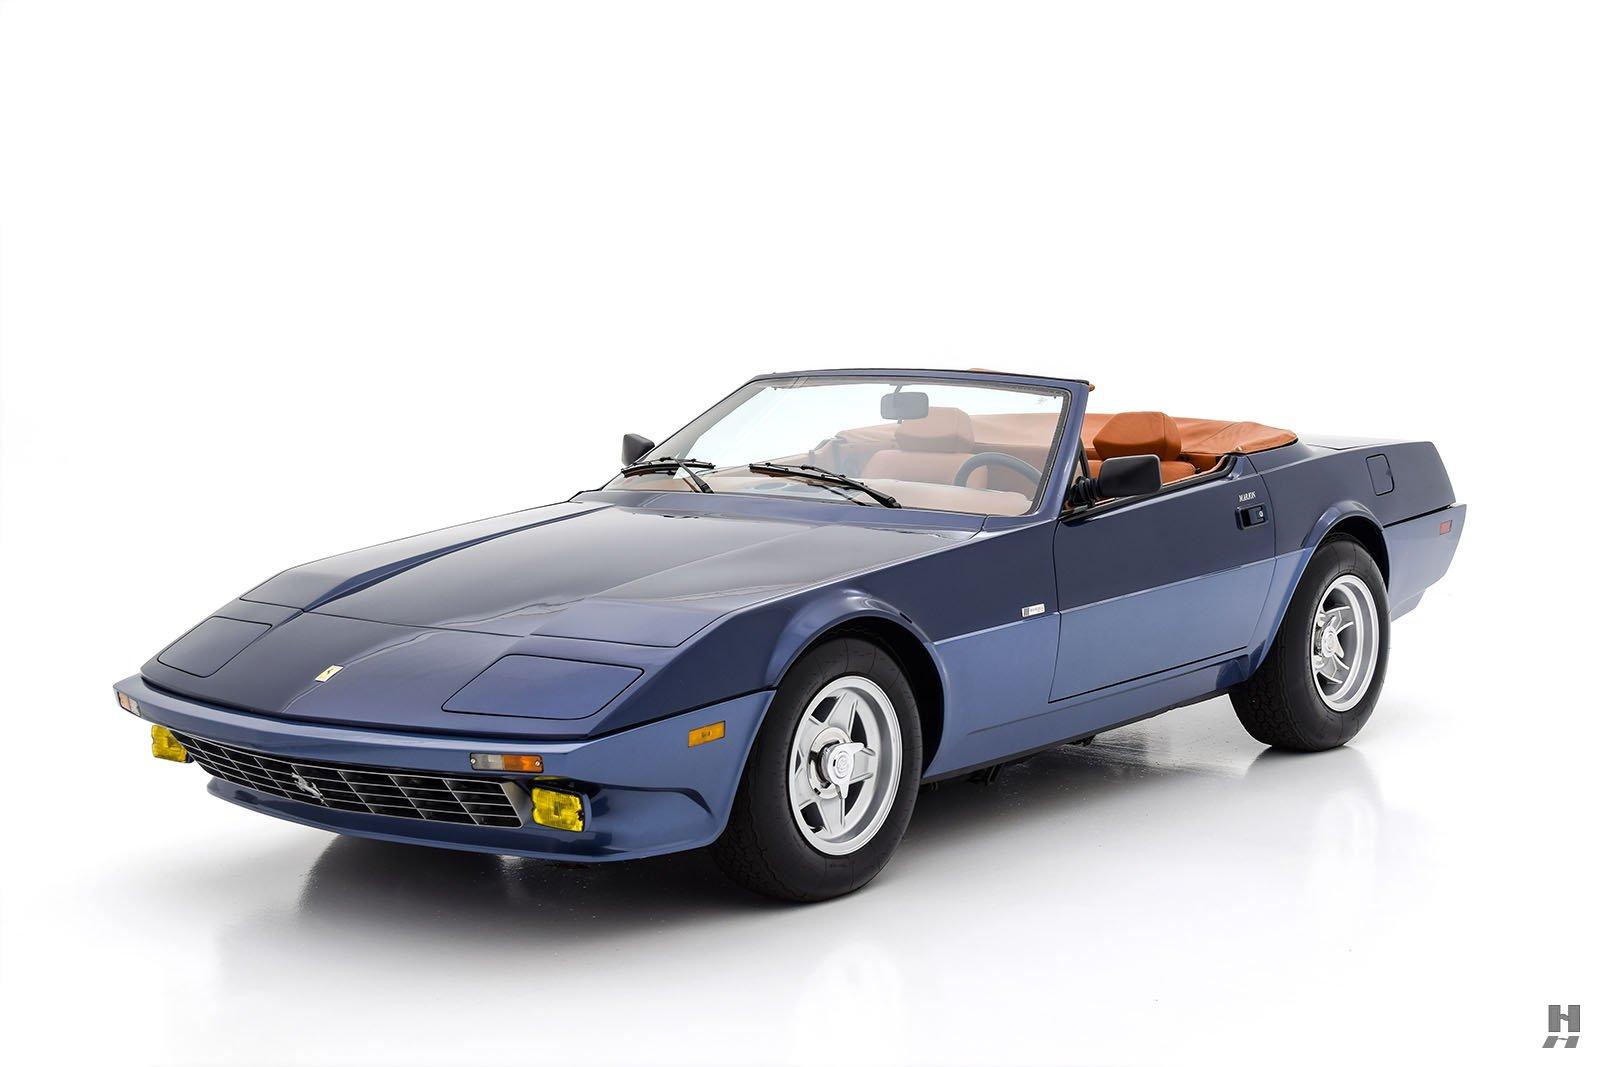 1971 Ferrari 365 GTB/4 NART Spyder For Sale | Buy Classic Cars ...